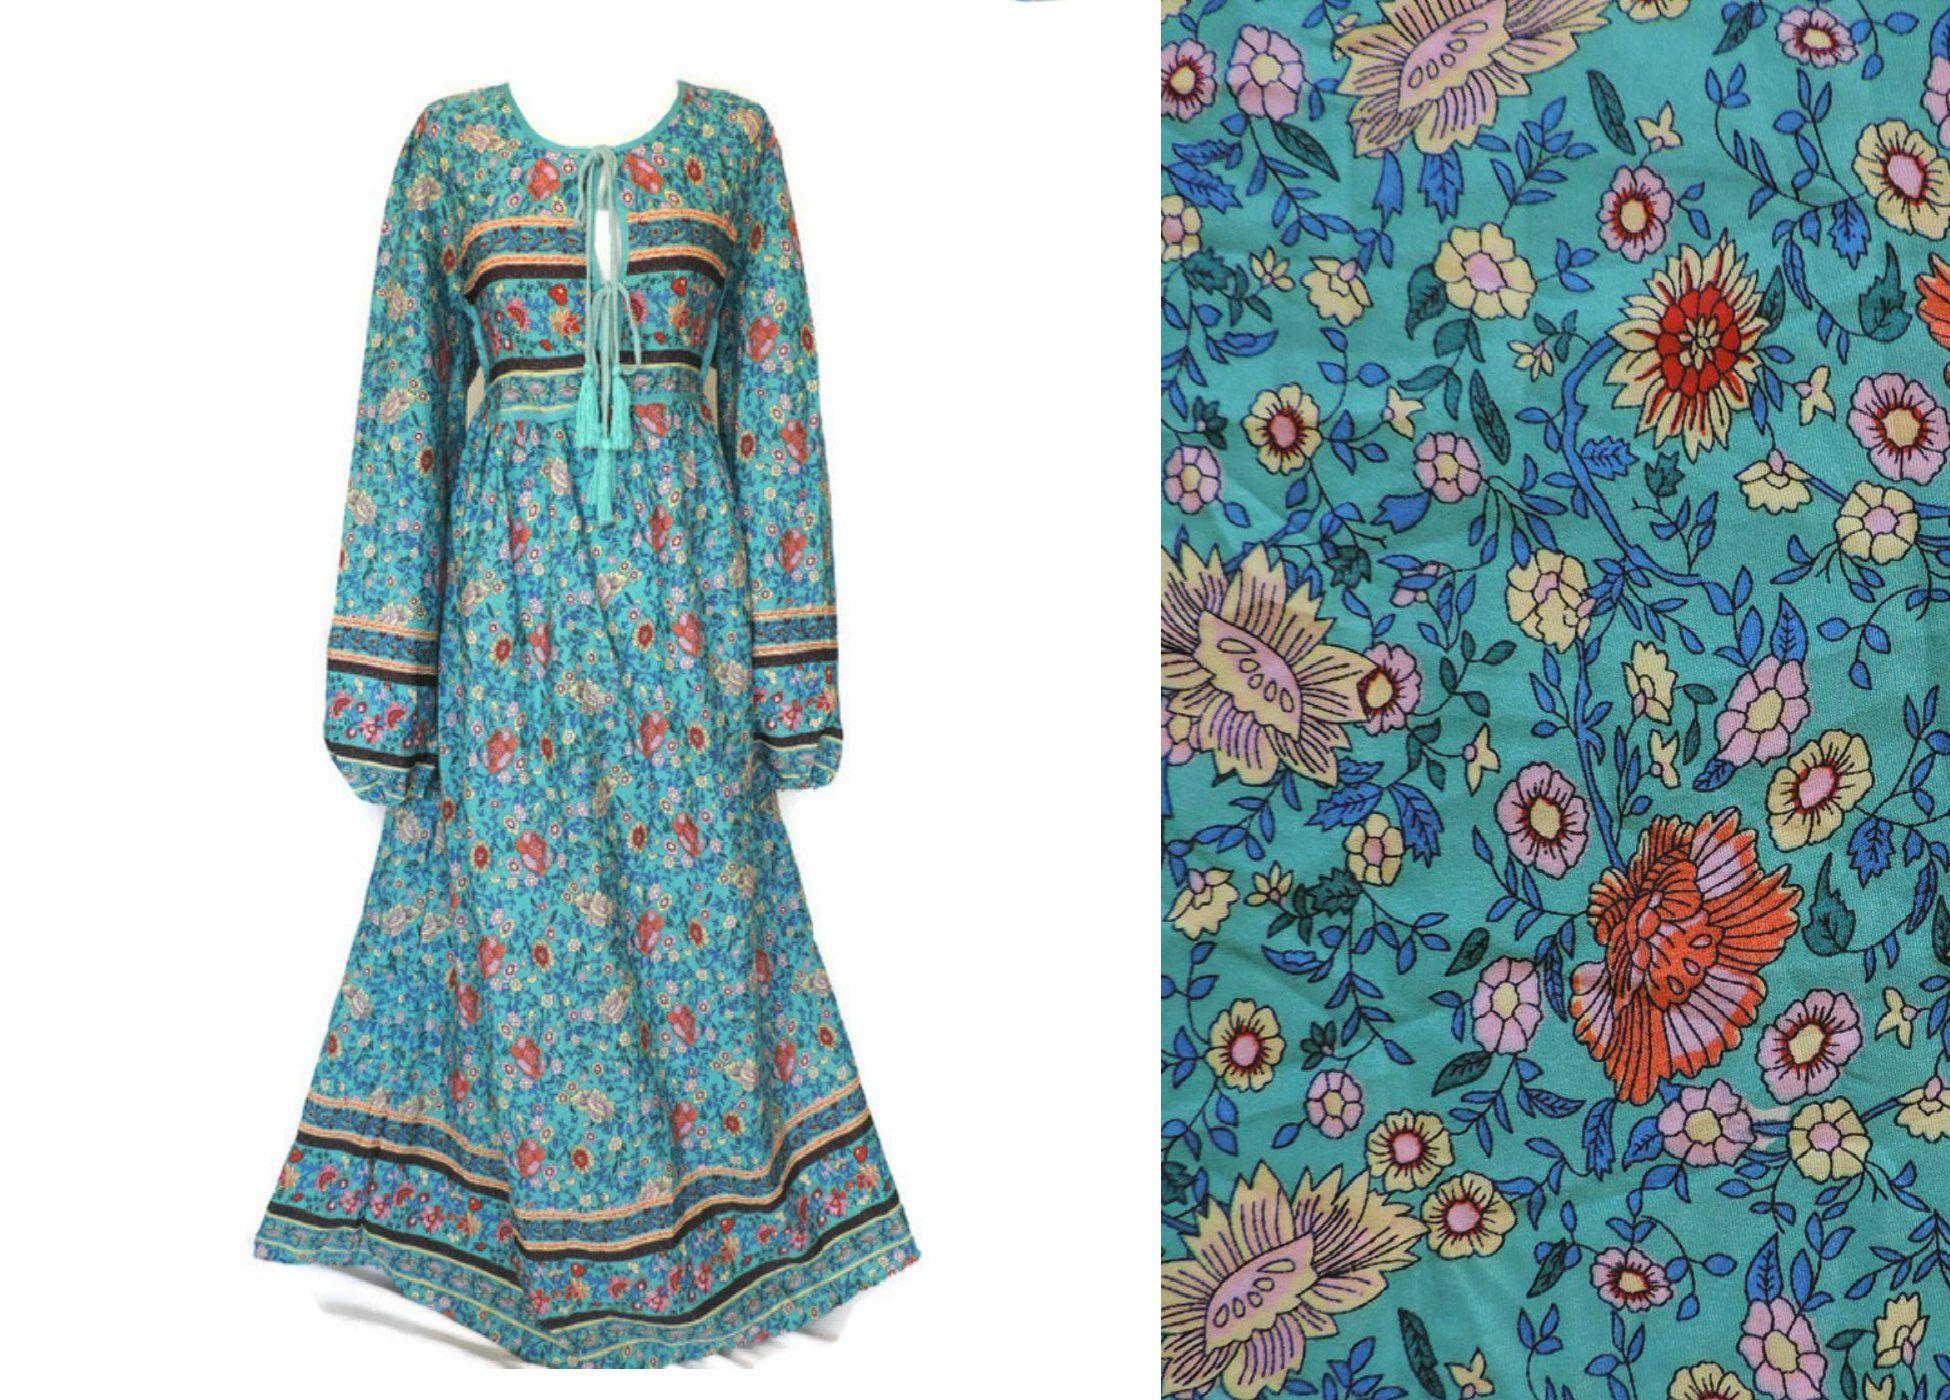 70s Brown Ditsy Floral Vivien Smith Dress With Peter Pan Etsy Hippie Dresses Vintage Maxi Dress Floral Maxi Dress [ 1400 x 1950 Pixel ]